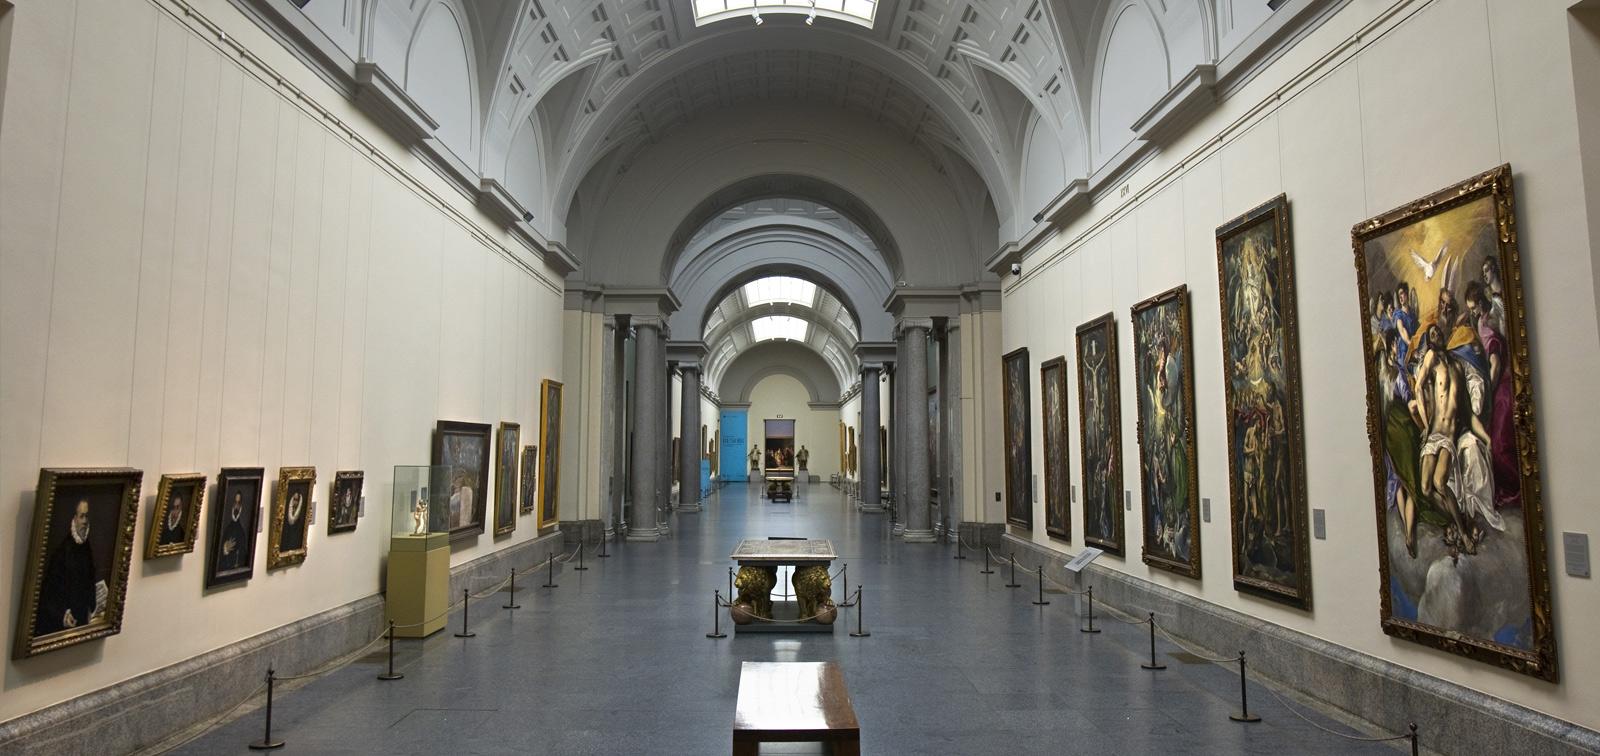 Becas 2020 Fundación Gondra Barandiarán - Museo del Prado para investigadores